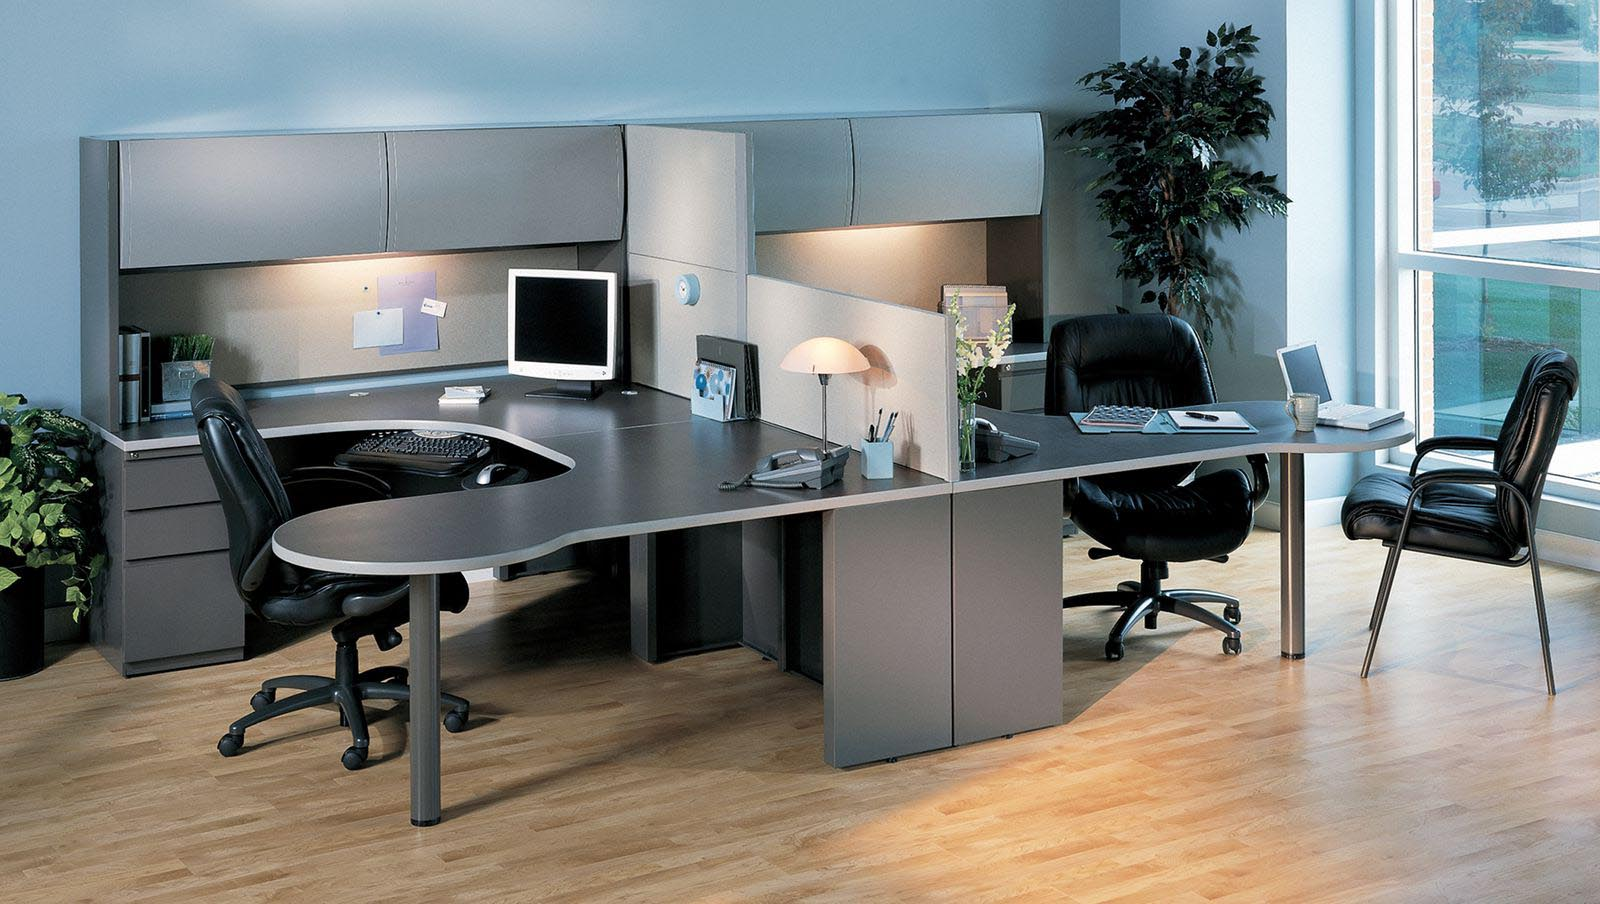 CSII Series Double P Table